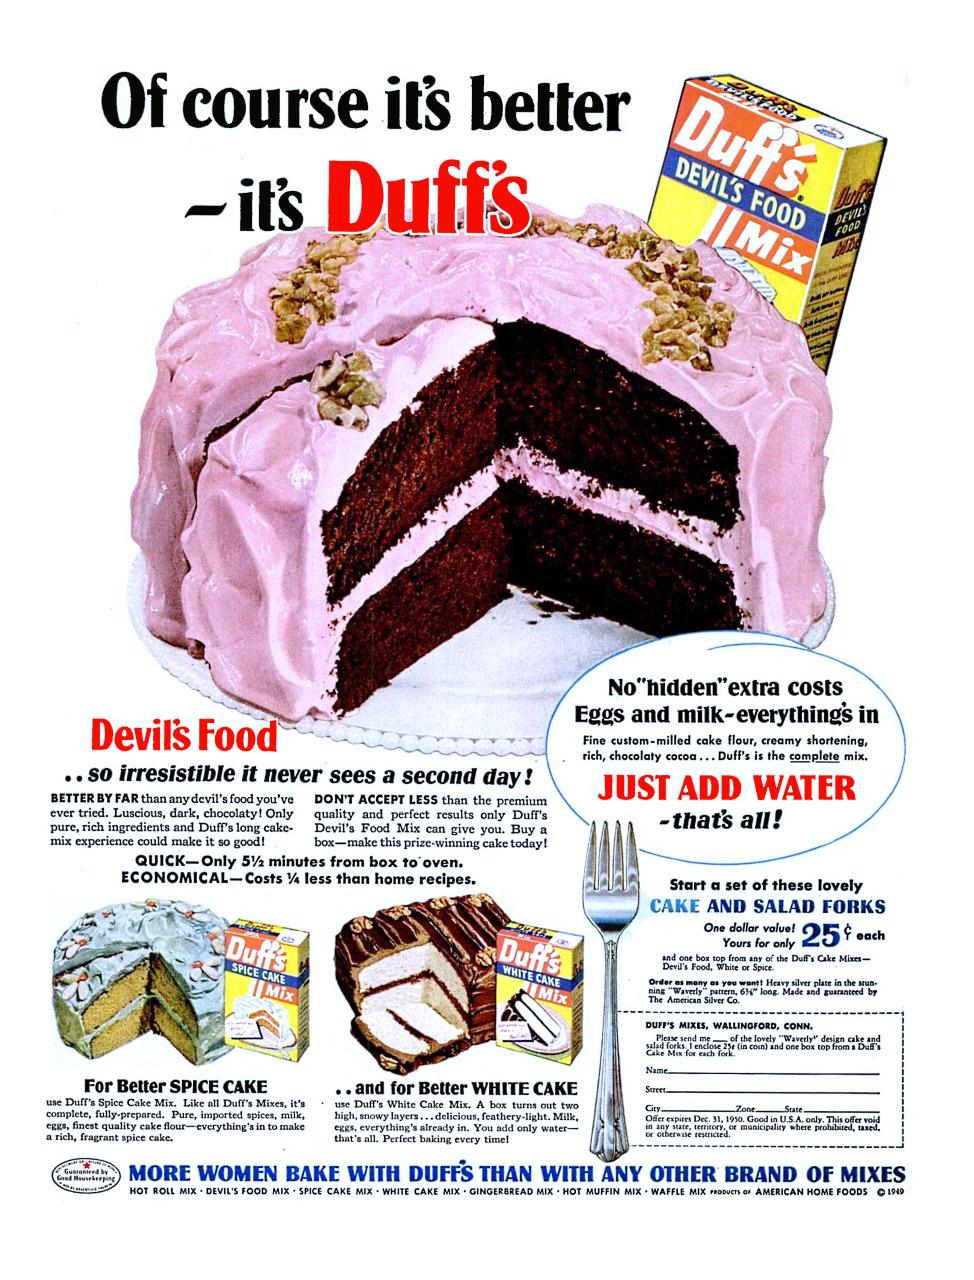 Duff's/American Home Foods - 1950